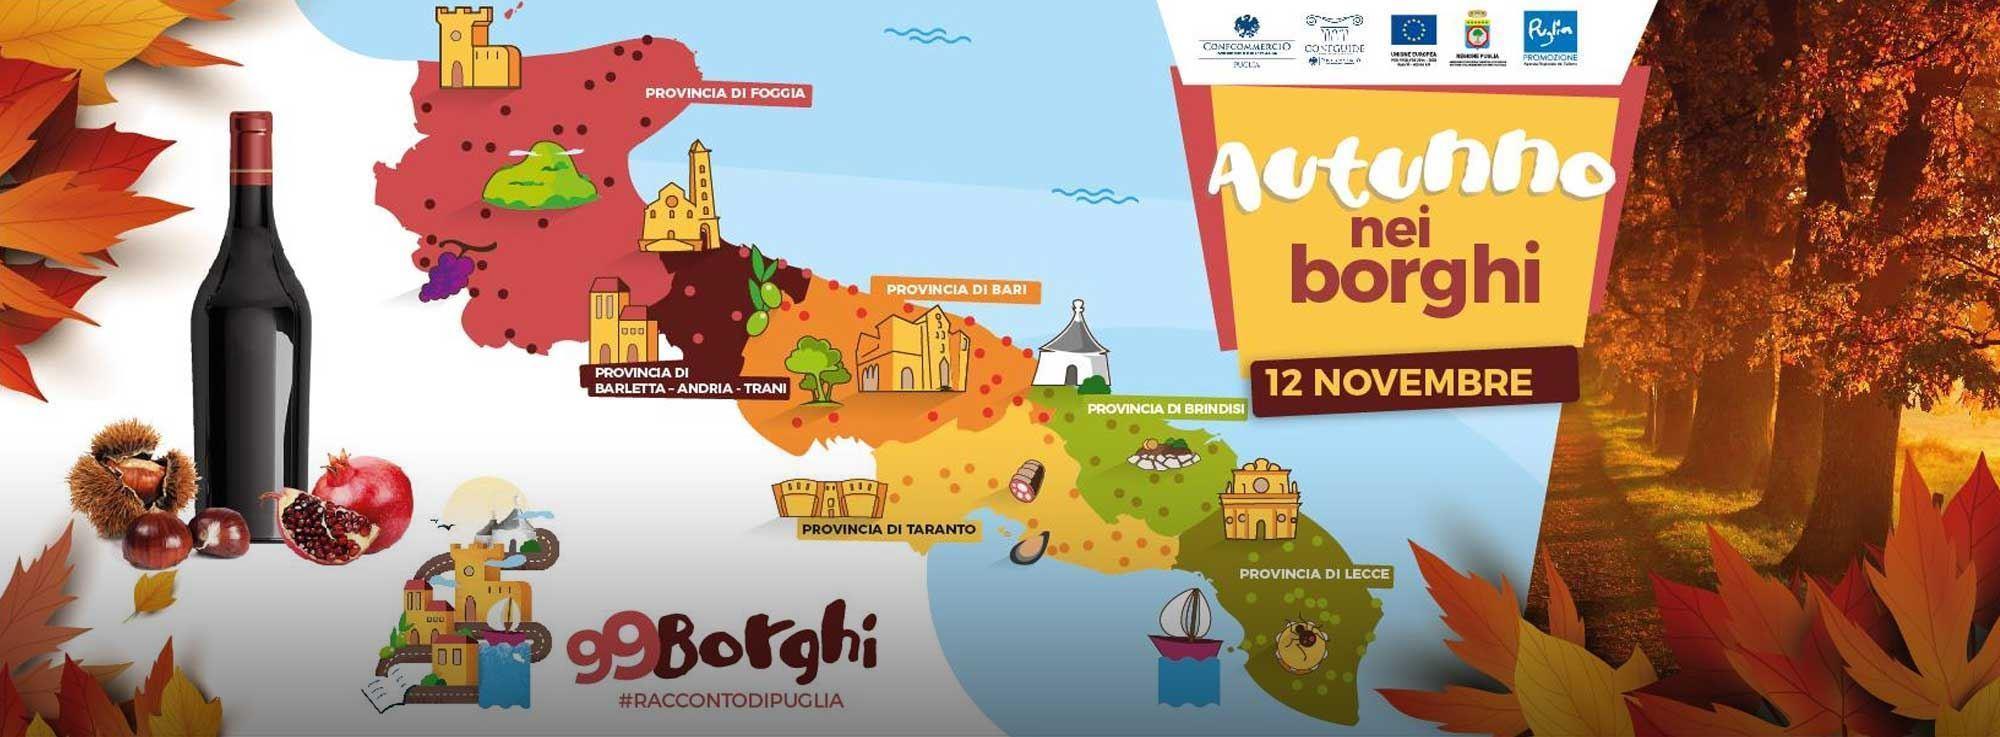 Manfredonia: 99 Borghi – #RaccontodiPuglia